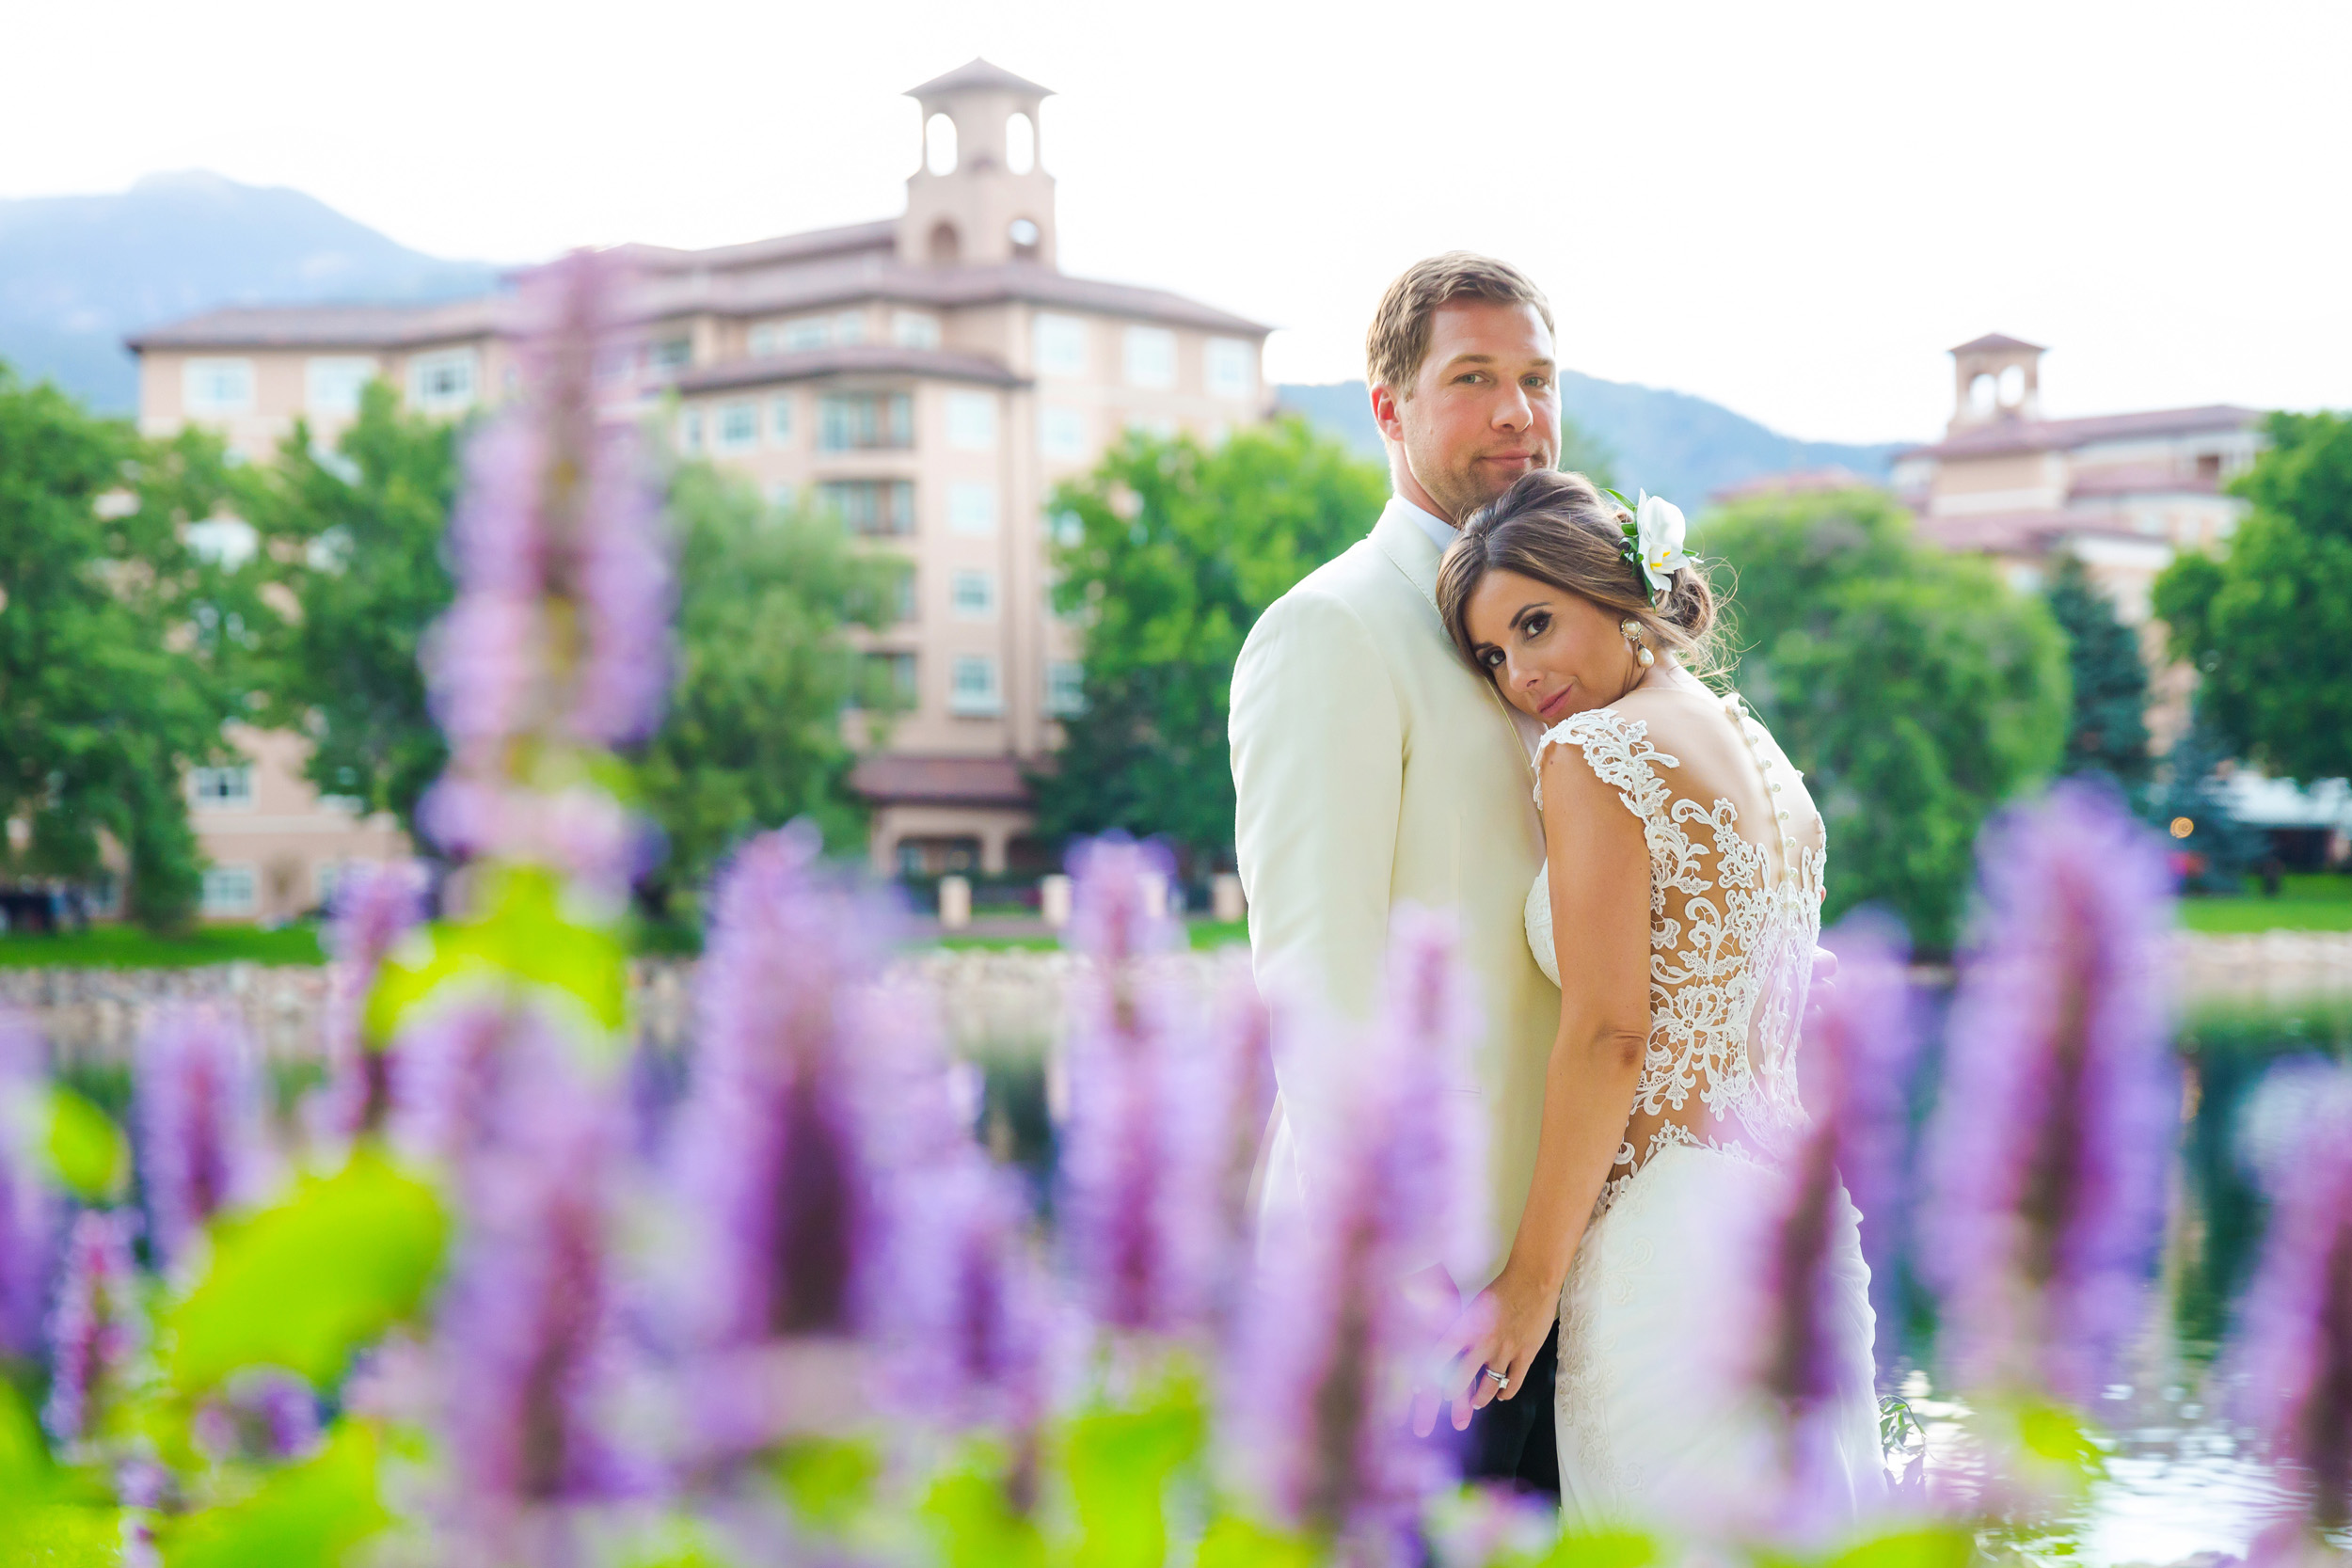 Colorado-Springs-Wedding-Photography-SS-002.jpg